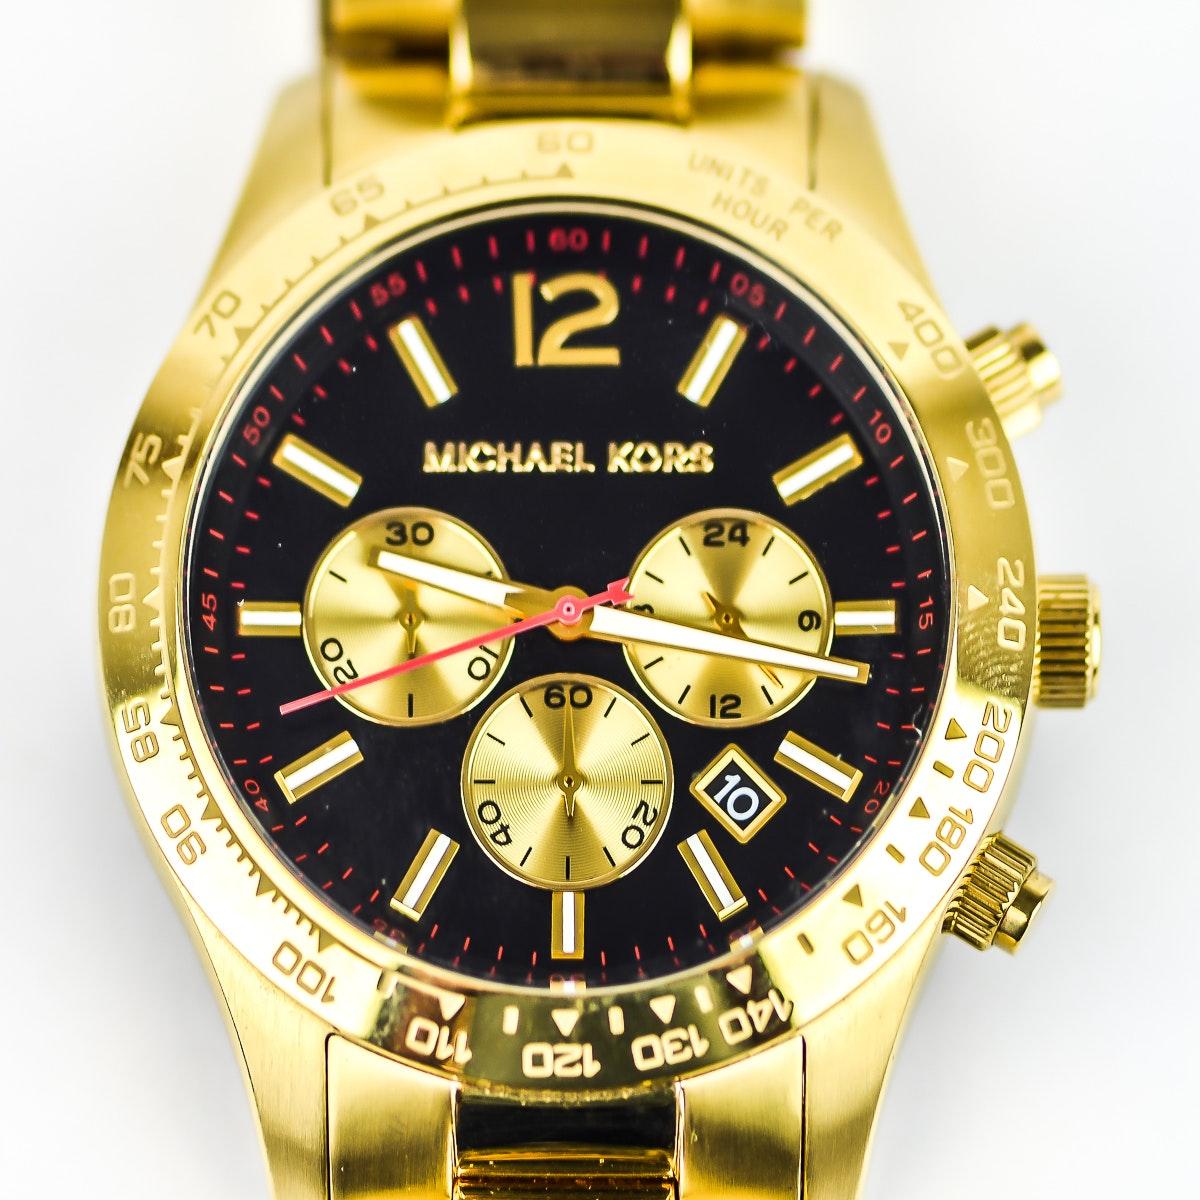 Men's Michael Kors Gold Plated Steel Chronograph Wristwatch